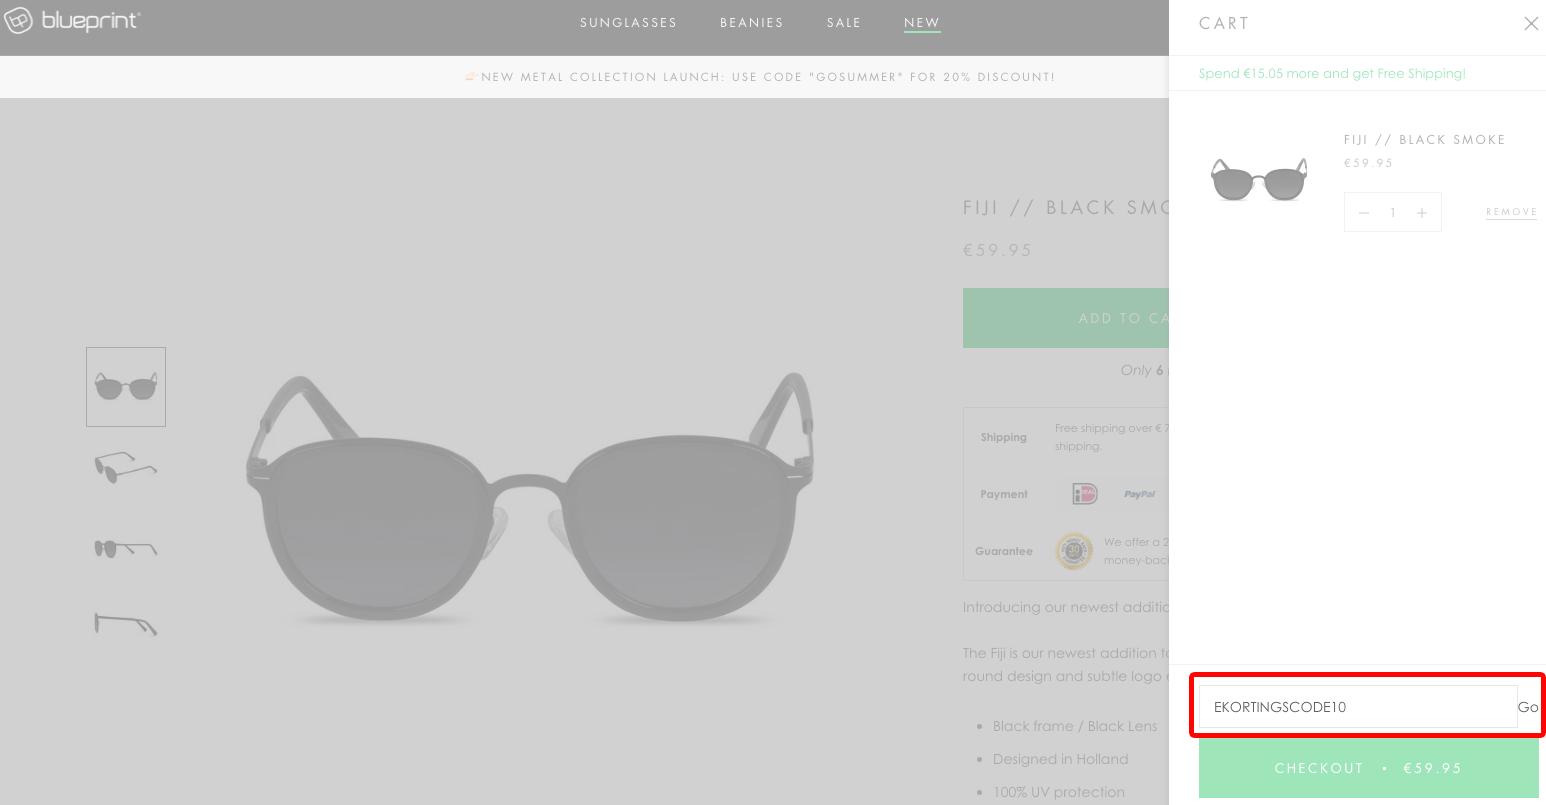 Blueprint Eyewear kortingscode gebruiken